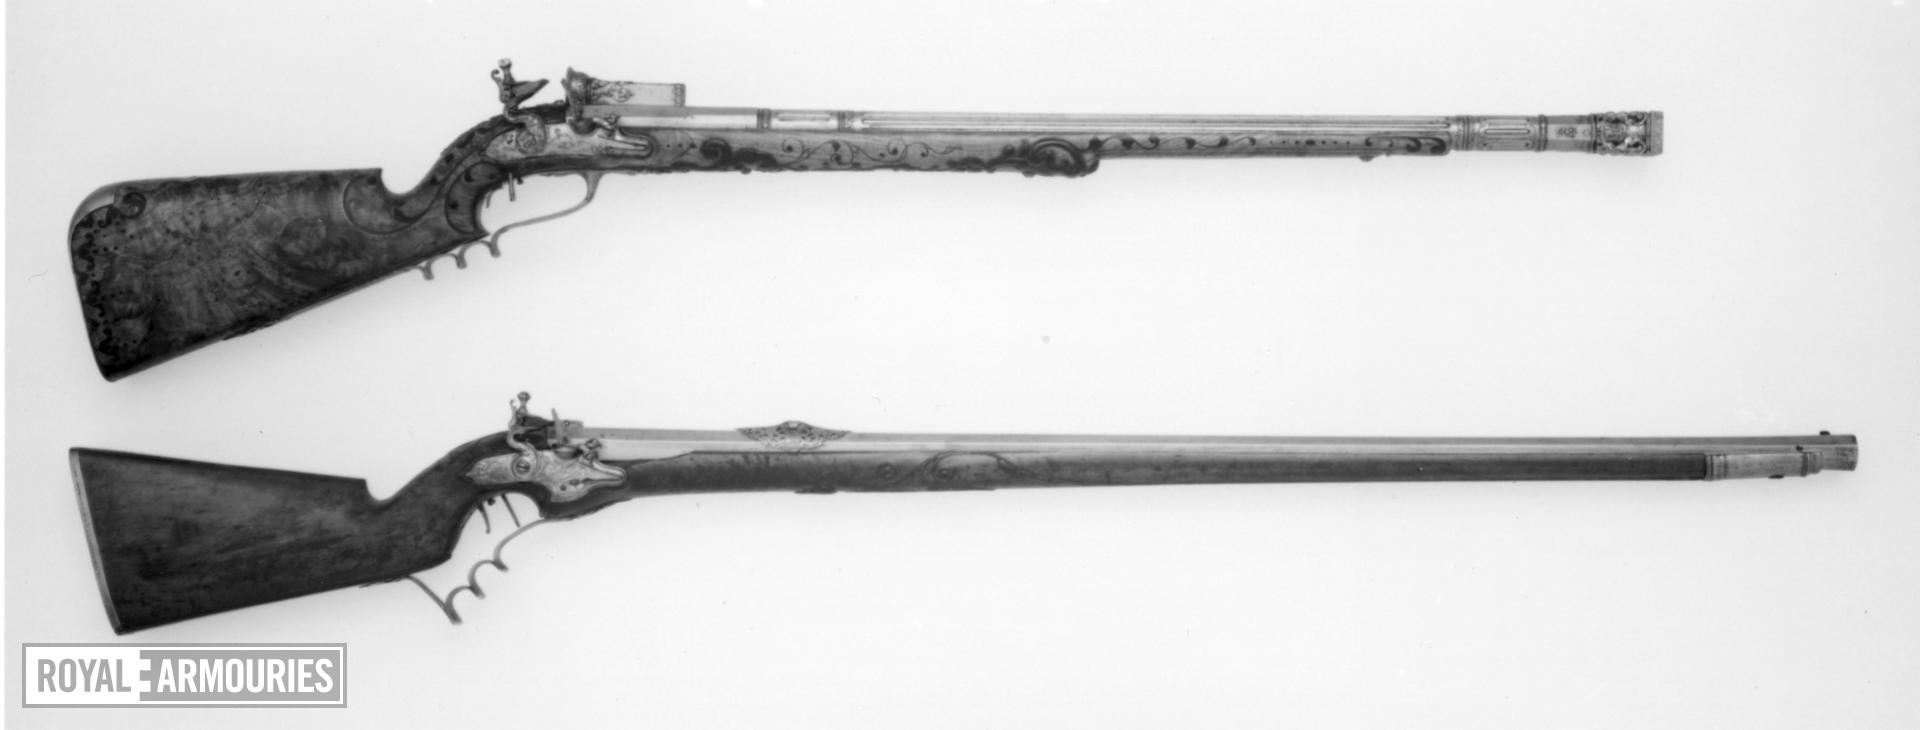 Flintlock muzzle-loading target rifle